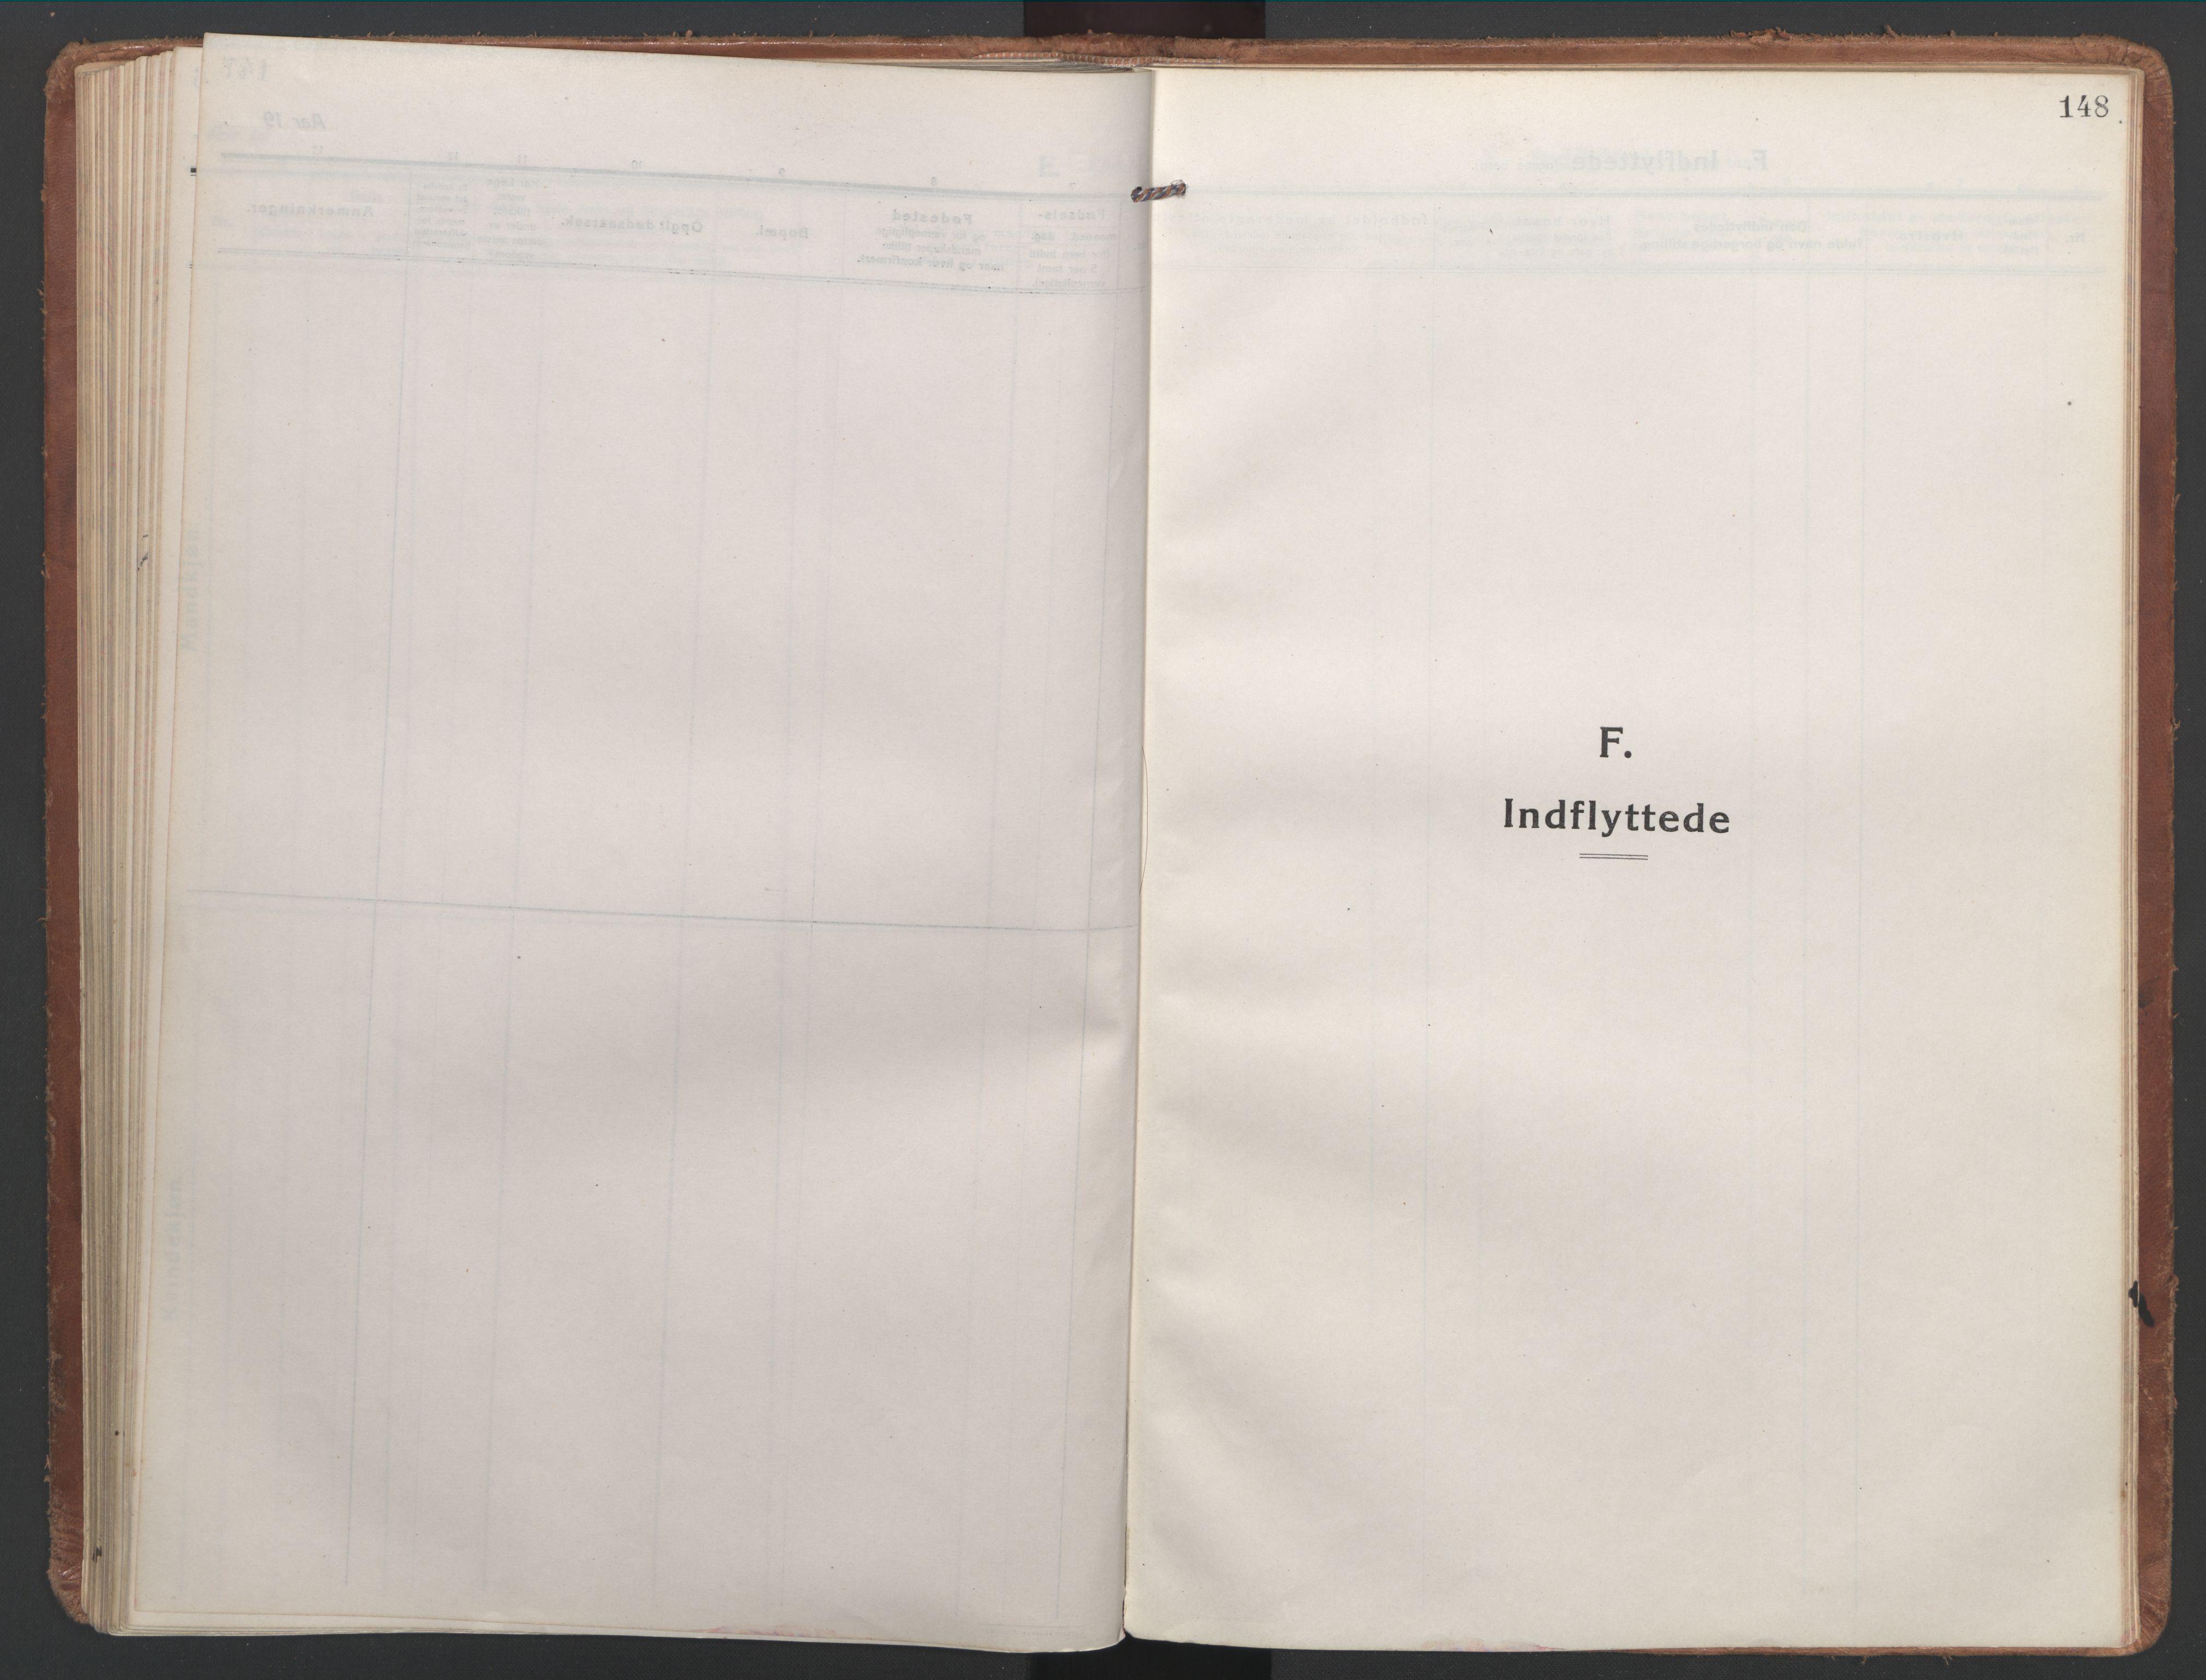 SAT, Ministerialprotokoller, klokkerbøker og fødselsregistre - Nordland, 886/L1222: Ministerialbok nr. 886A04, 1914-1926, s. 148